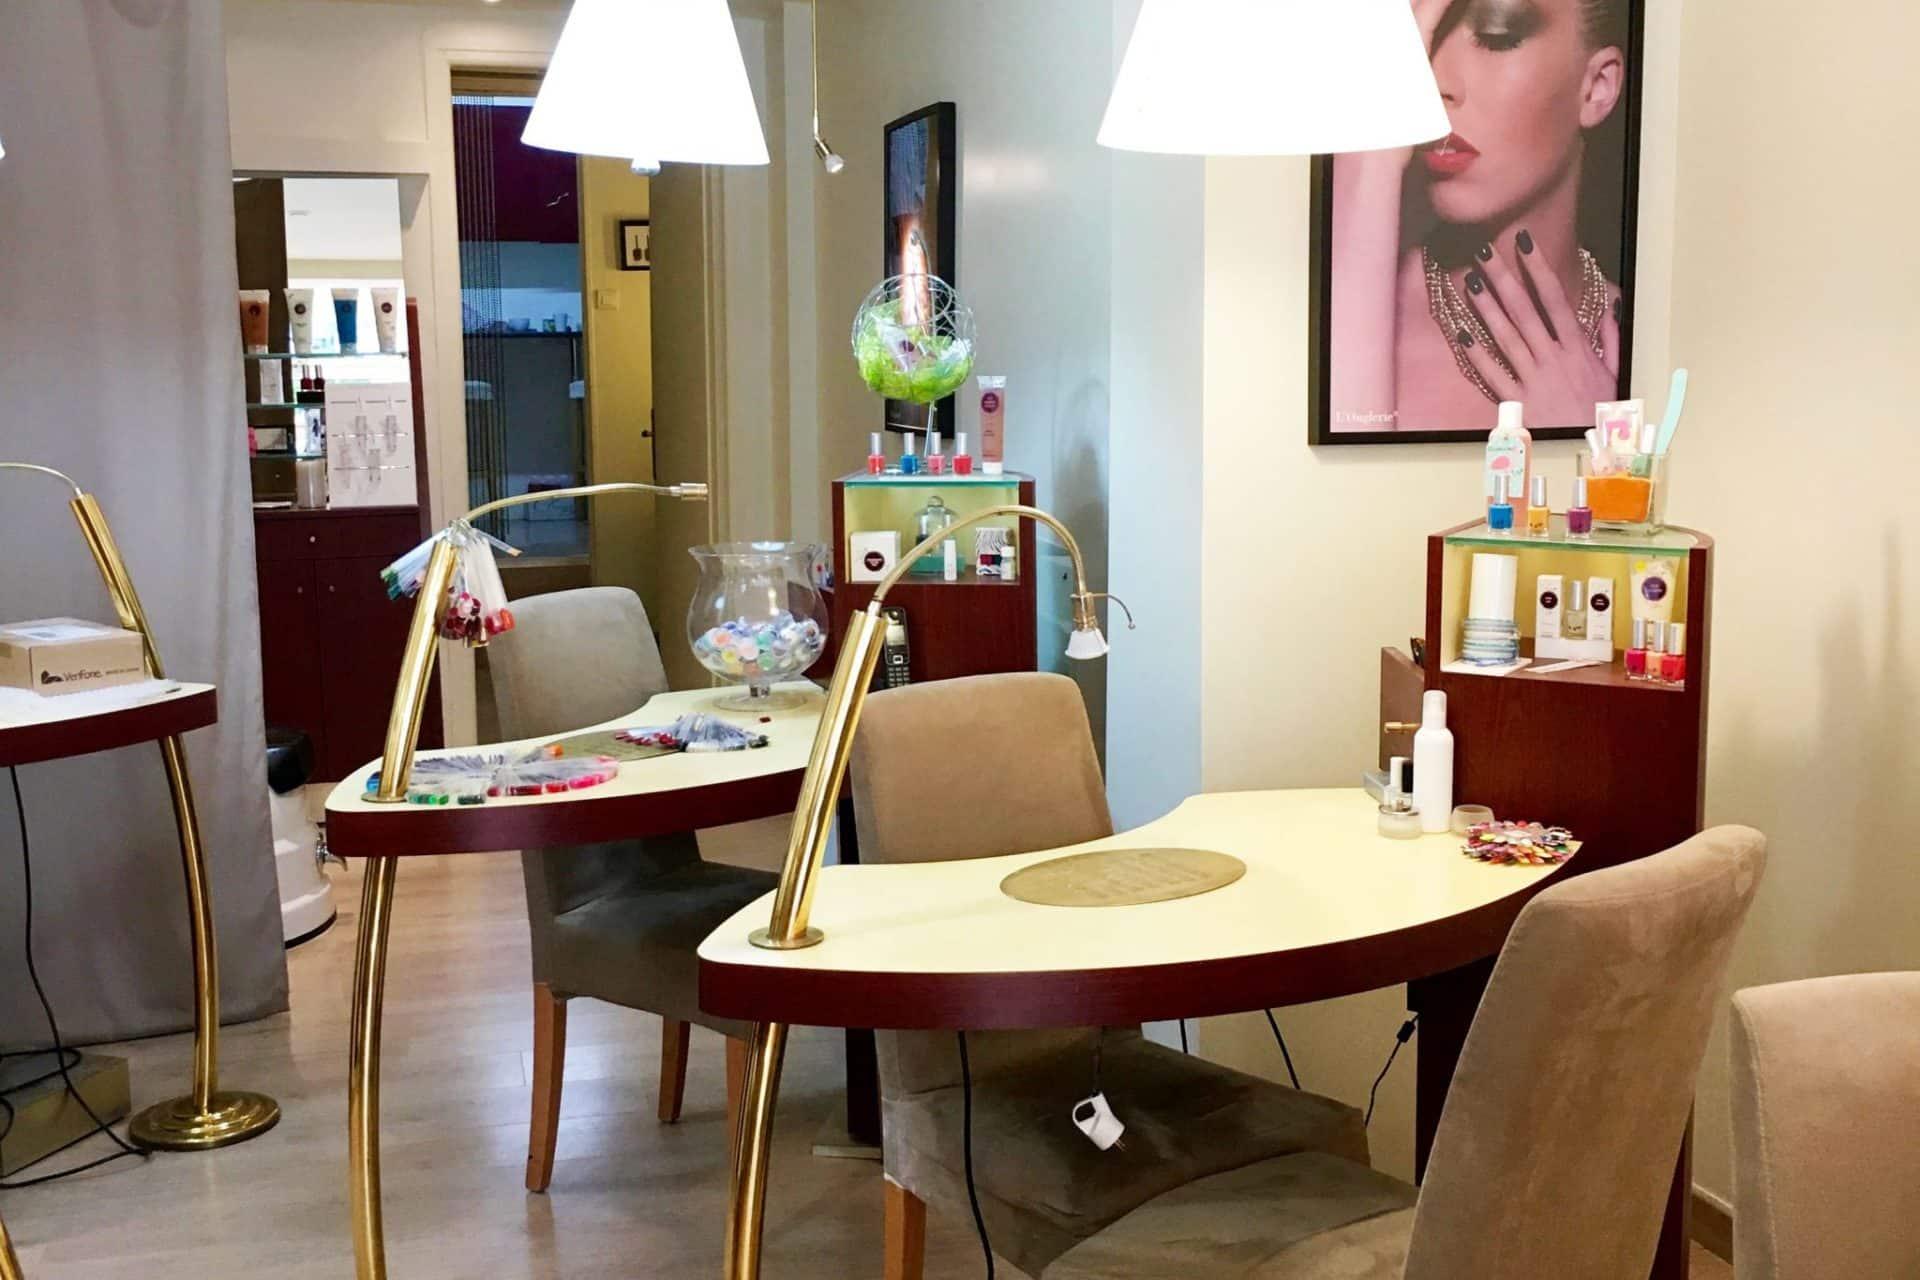 institut l 39 onglerie troyes bar ongle pose french manucure. Black Bedroom Furniture Sets. Home Design Ideas